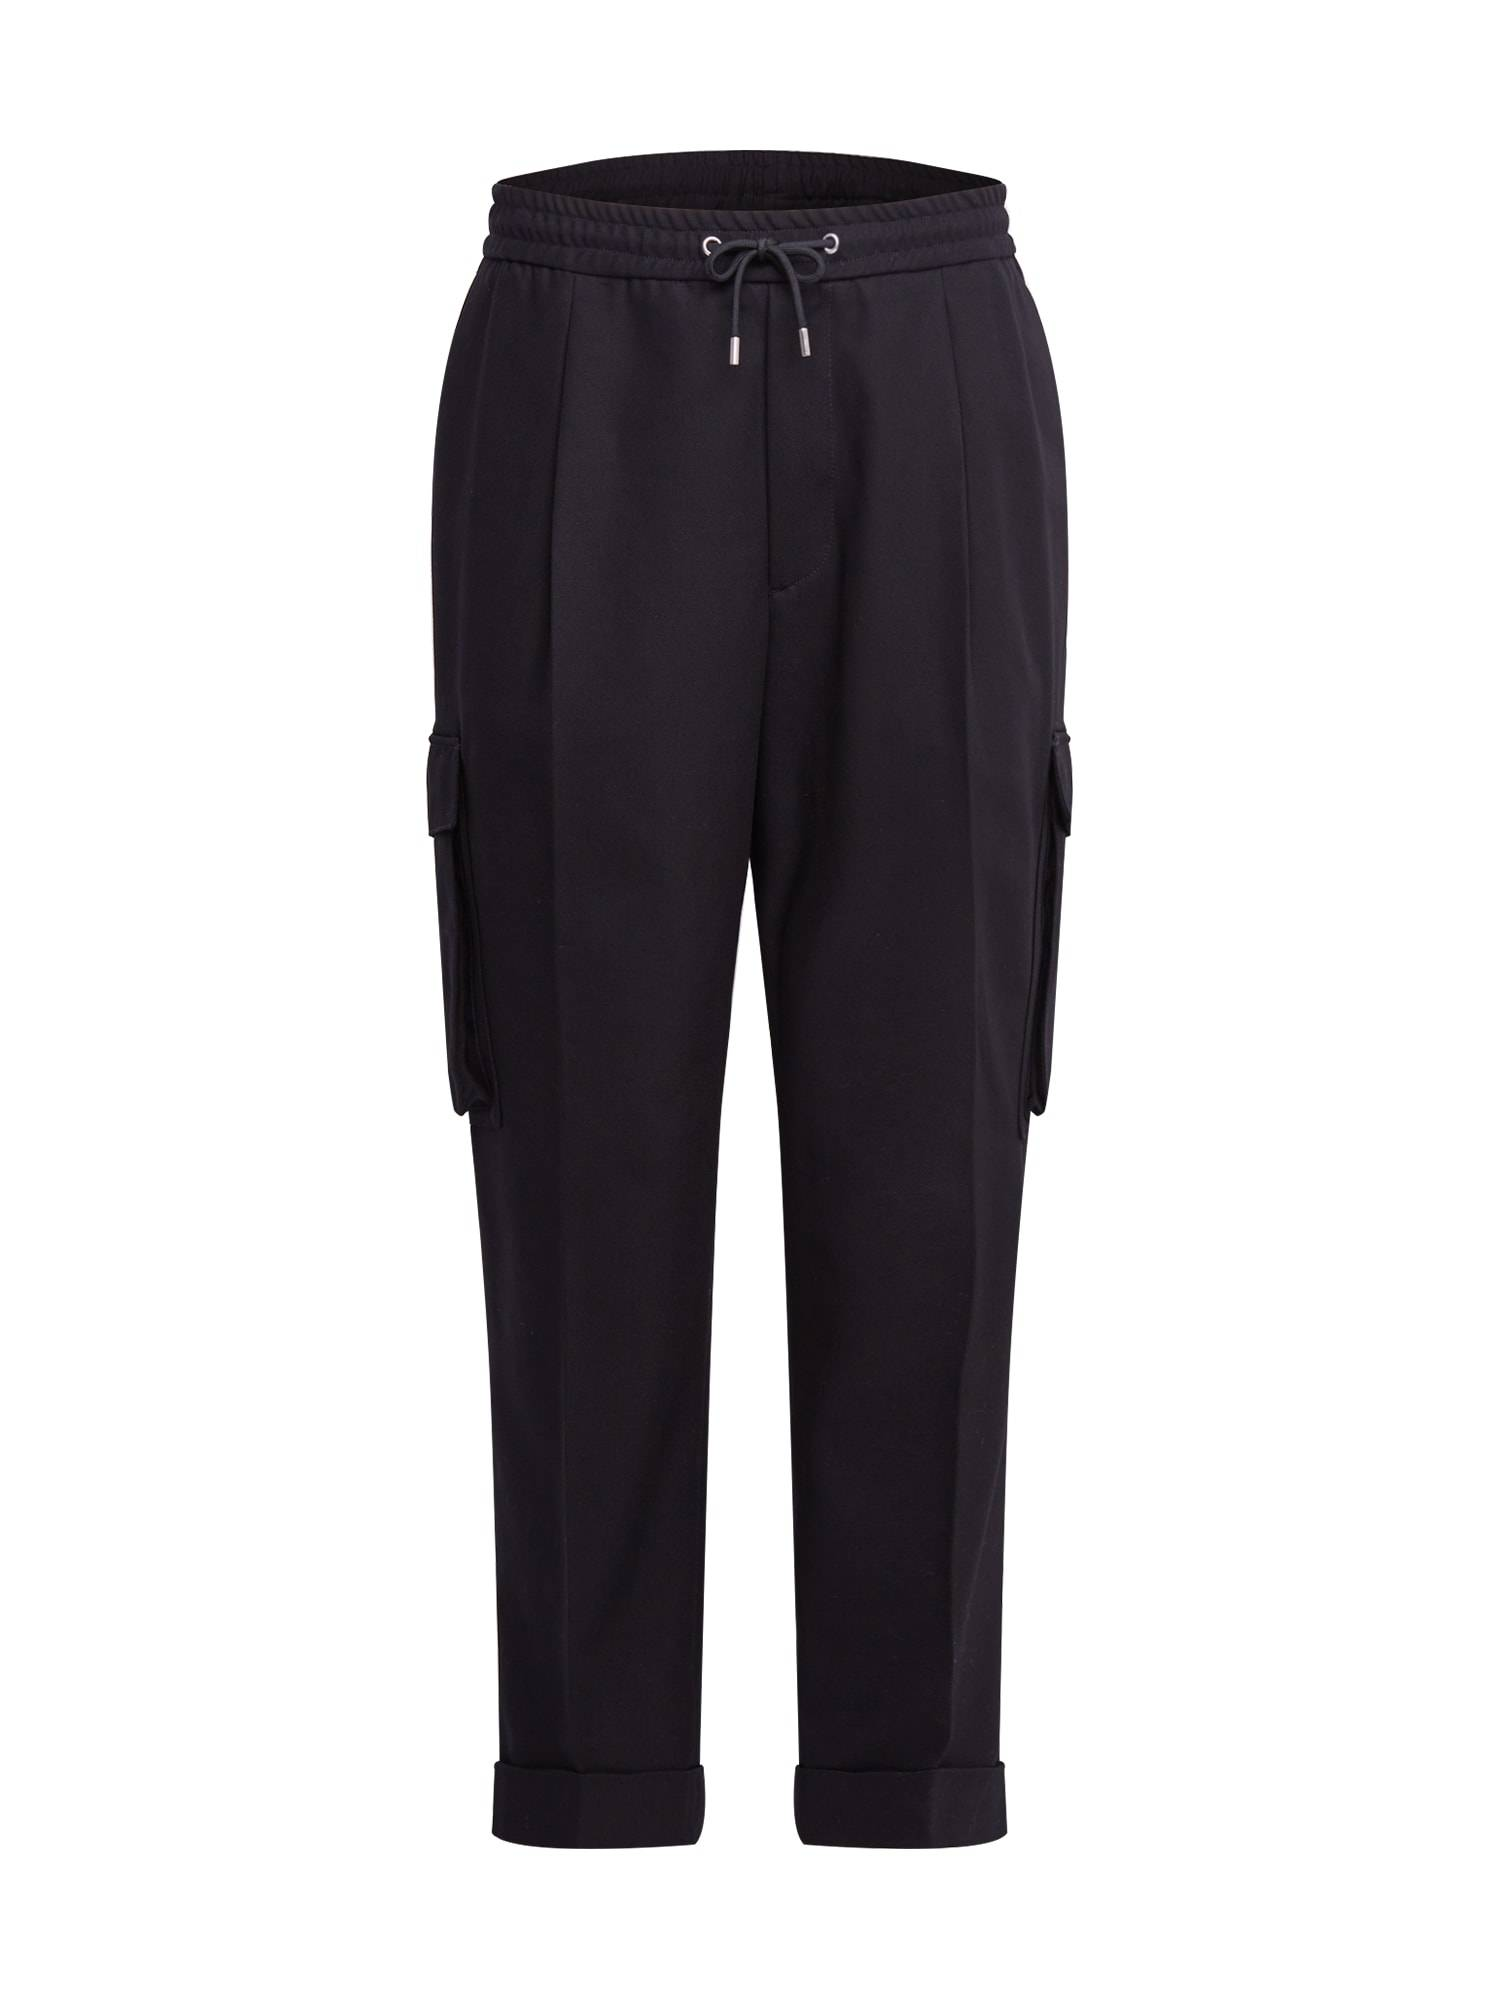 The Kooples Pantalon cargo  - Noir - Taille: 48 - male